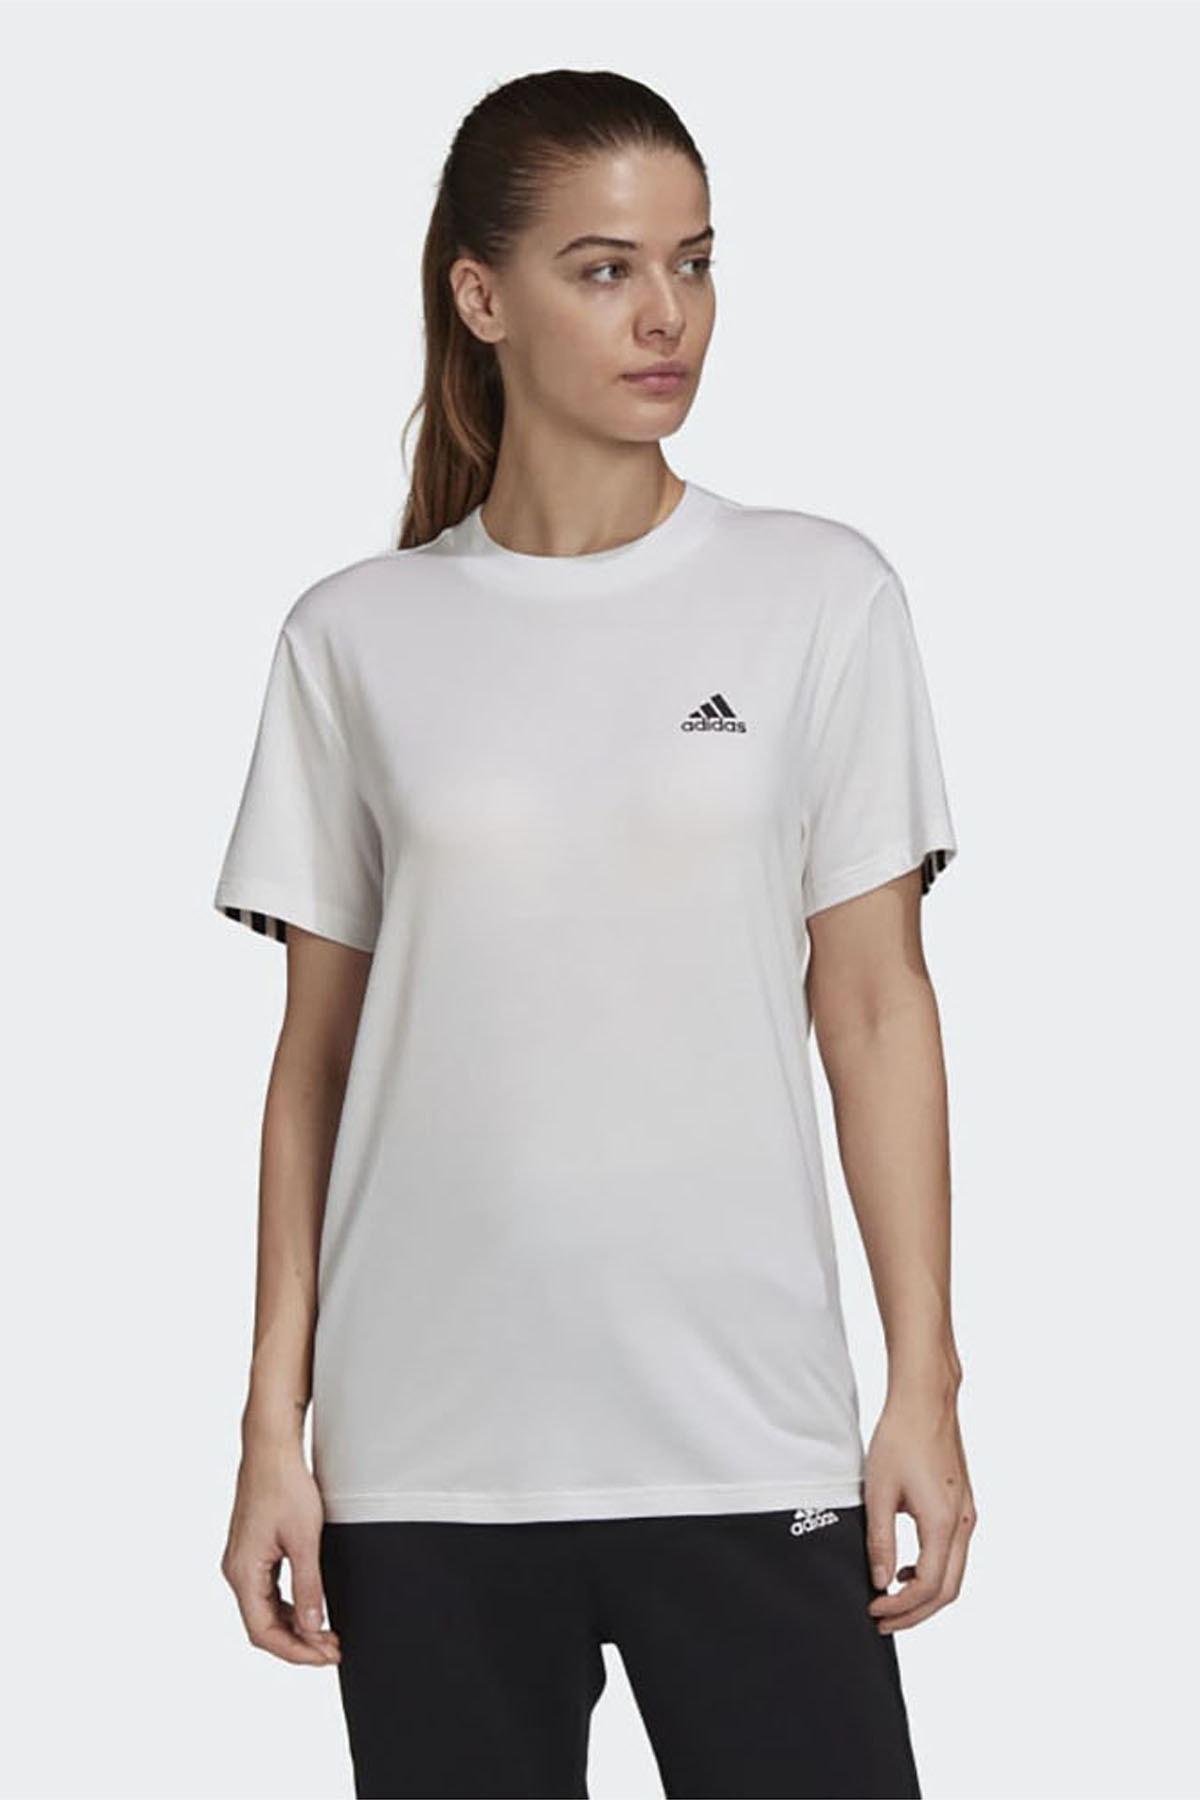 adidas Kadın Günlük Giyim T-shirt W Mh 3s Ss Tee Gh3799